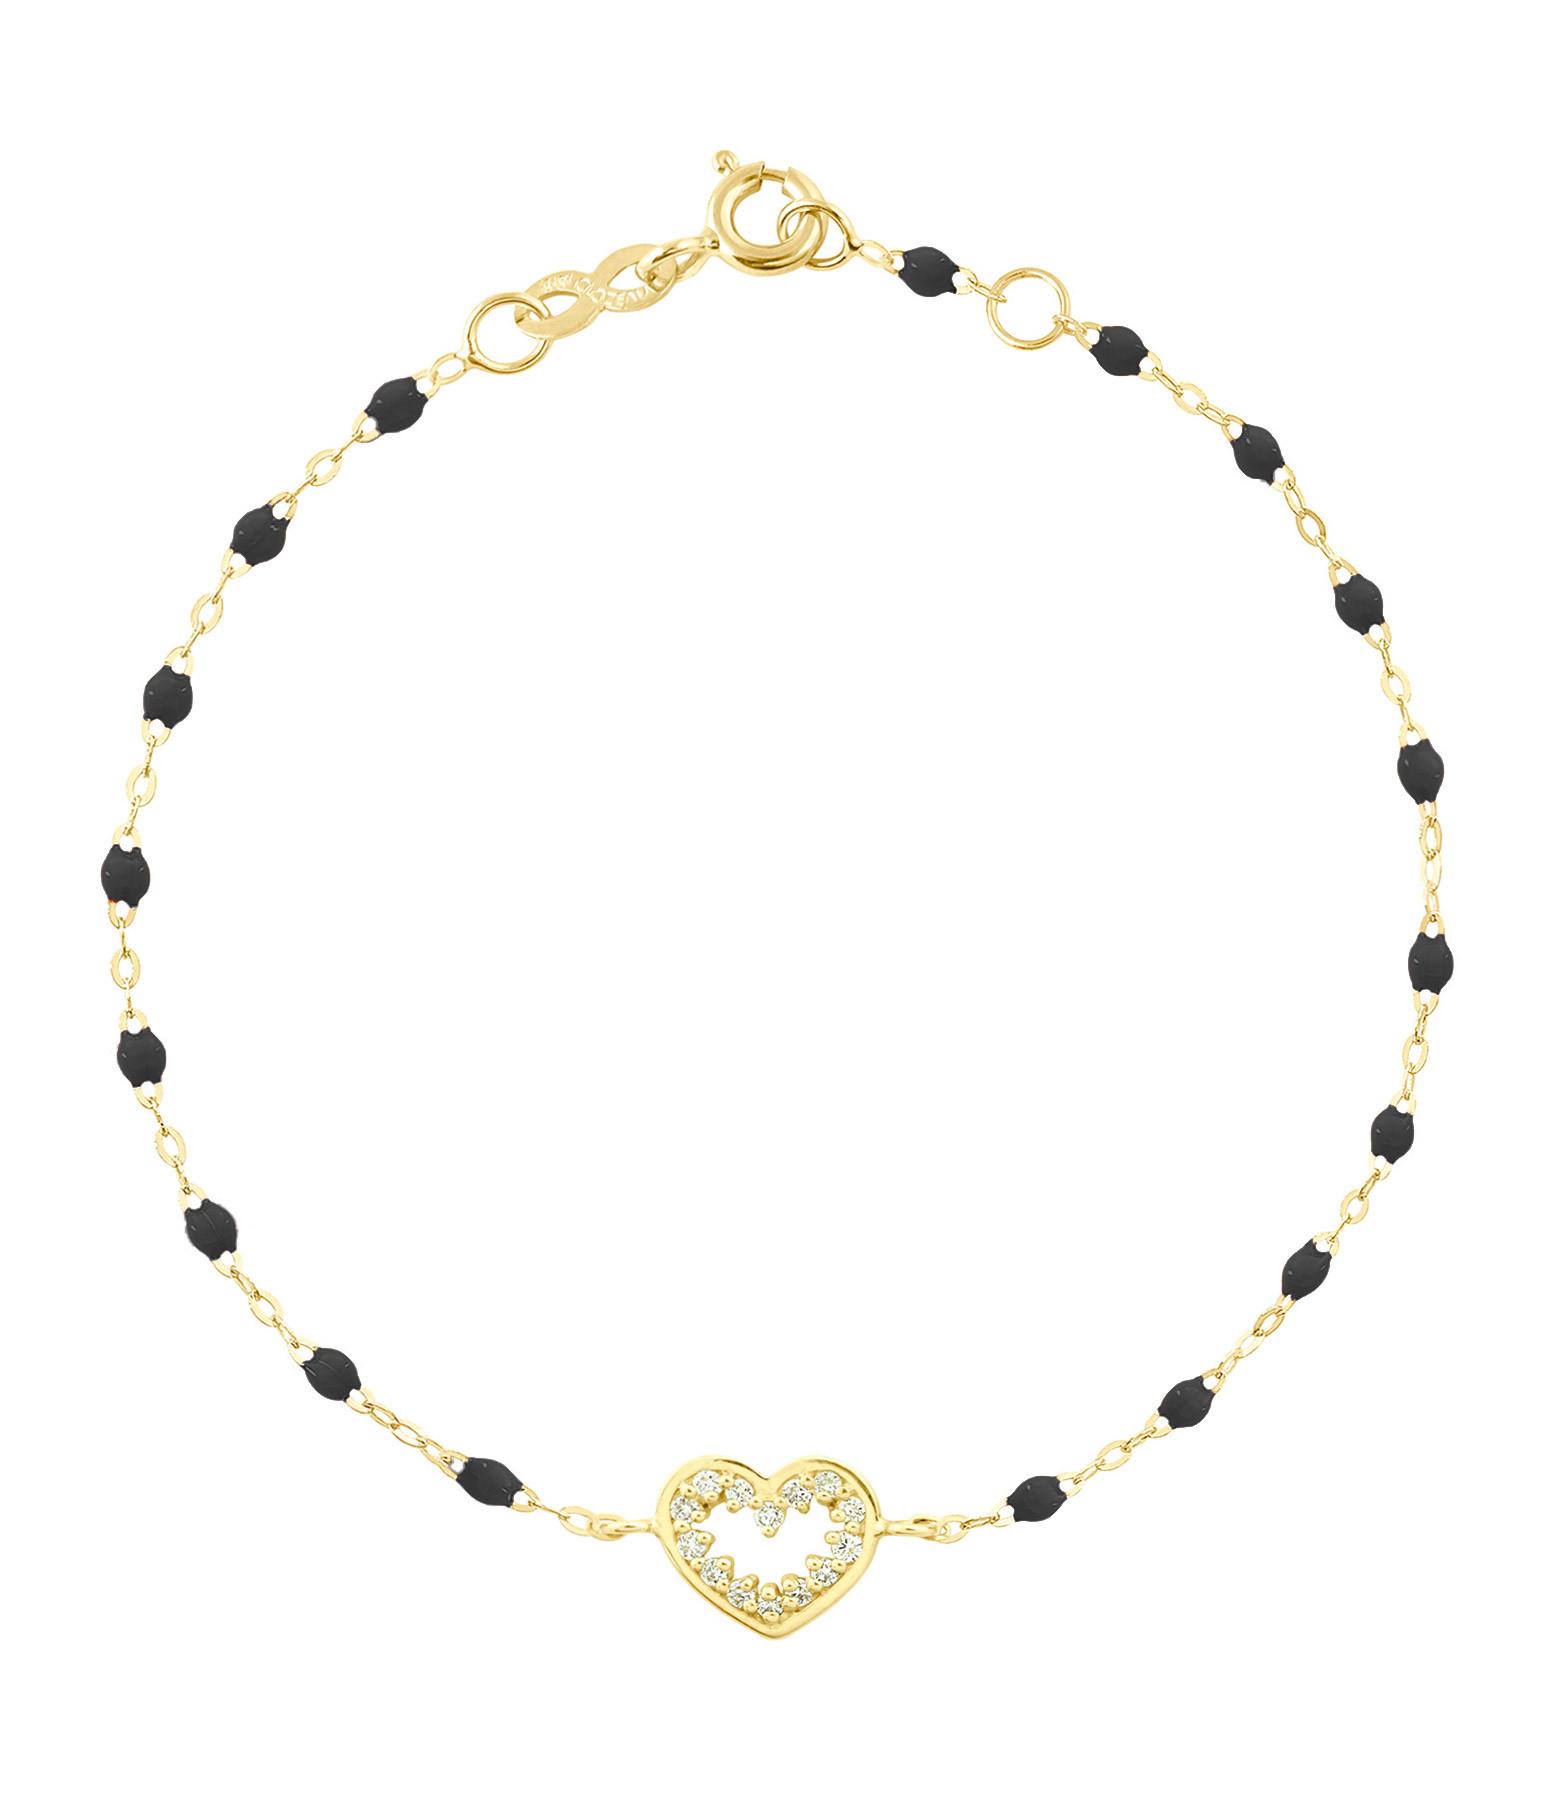 GIGI CLOZEAU - Bracelet Résine CŒur Suprême Diams OJ